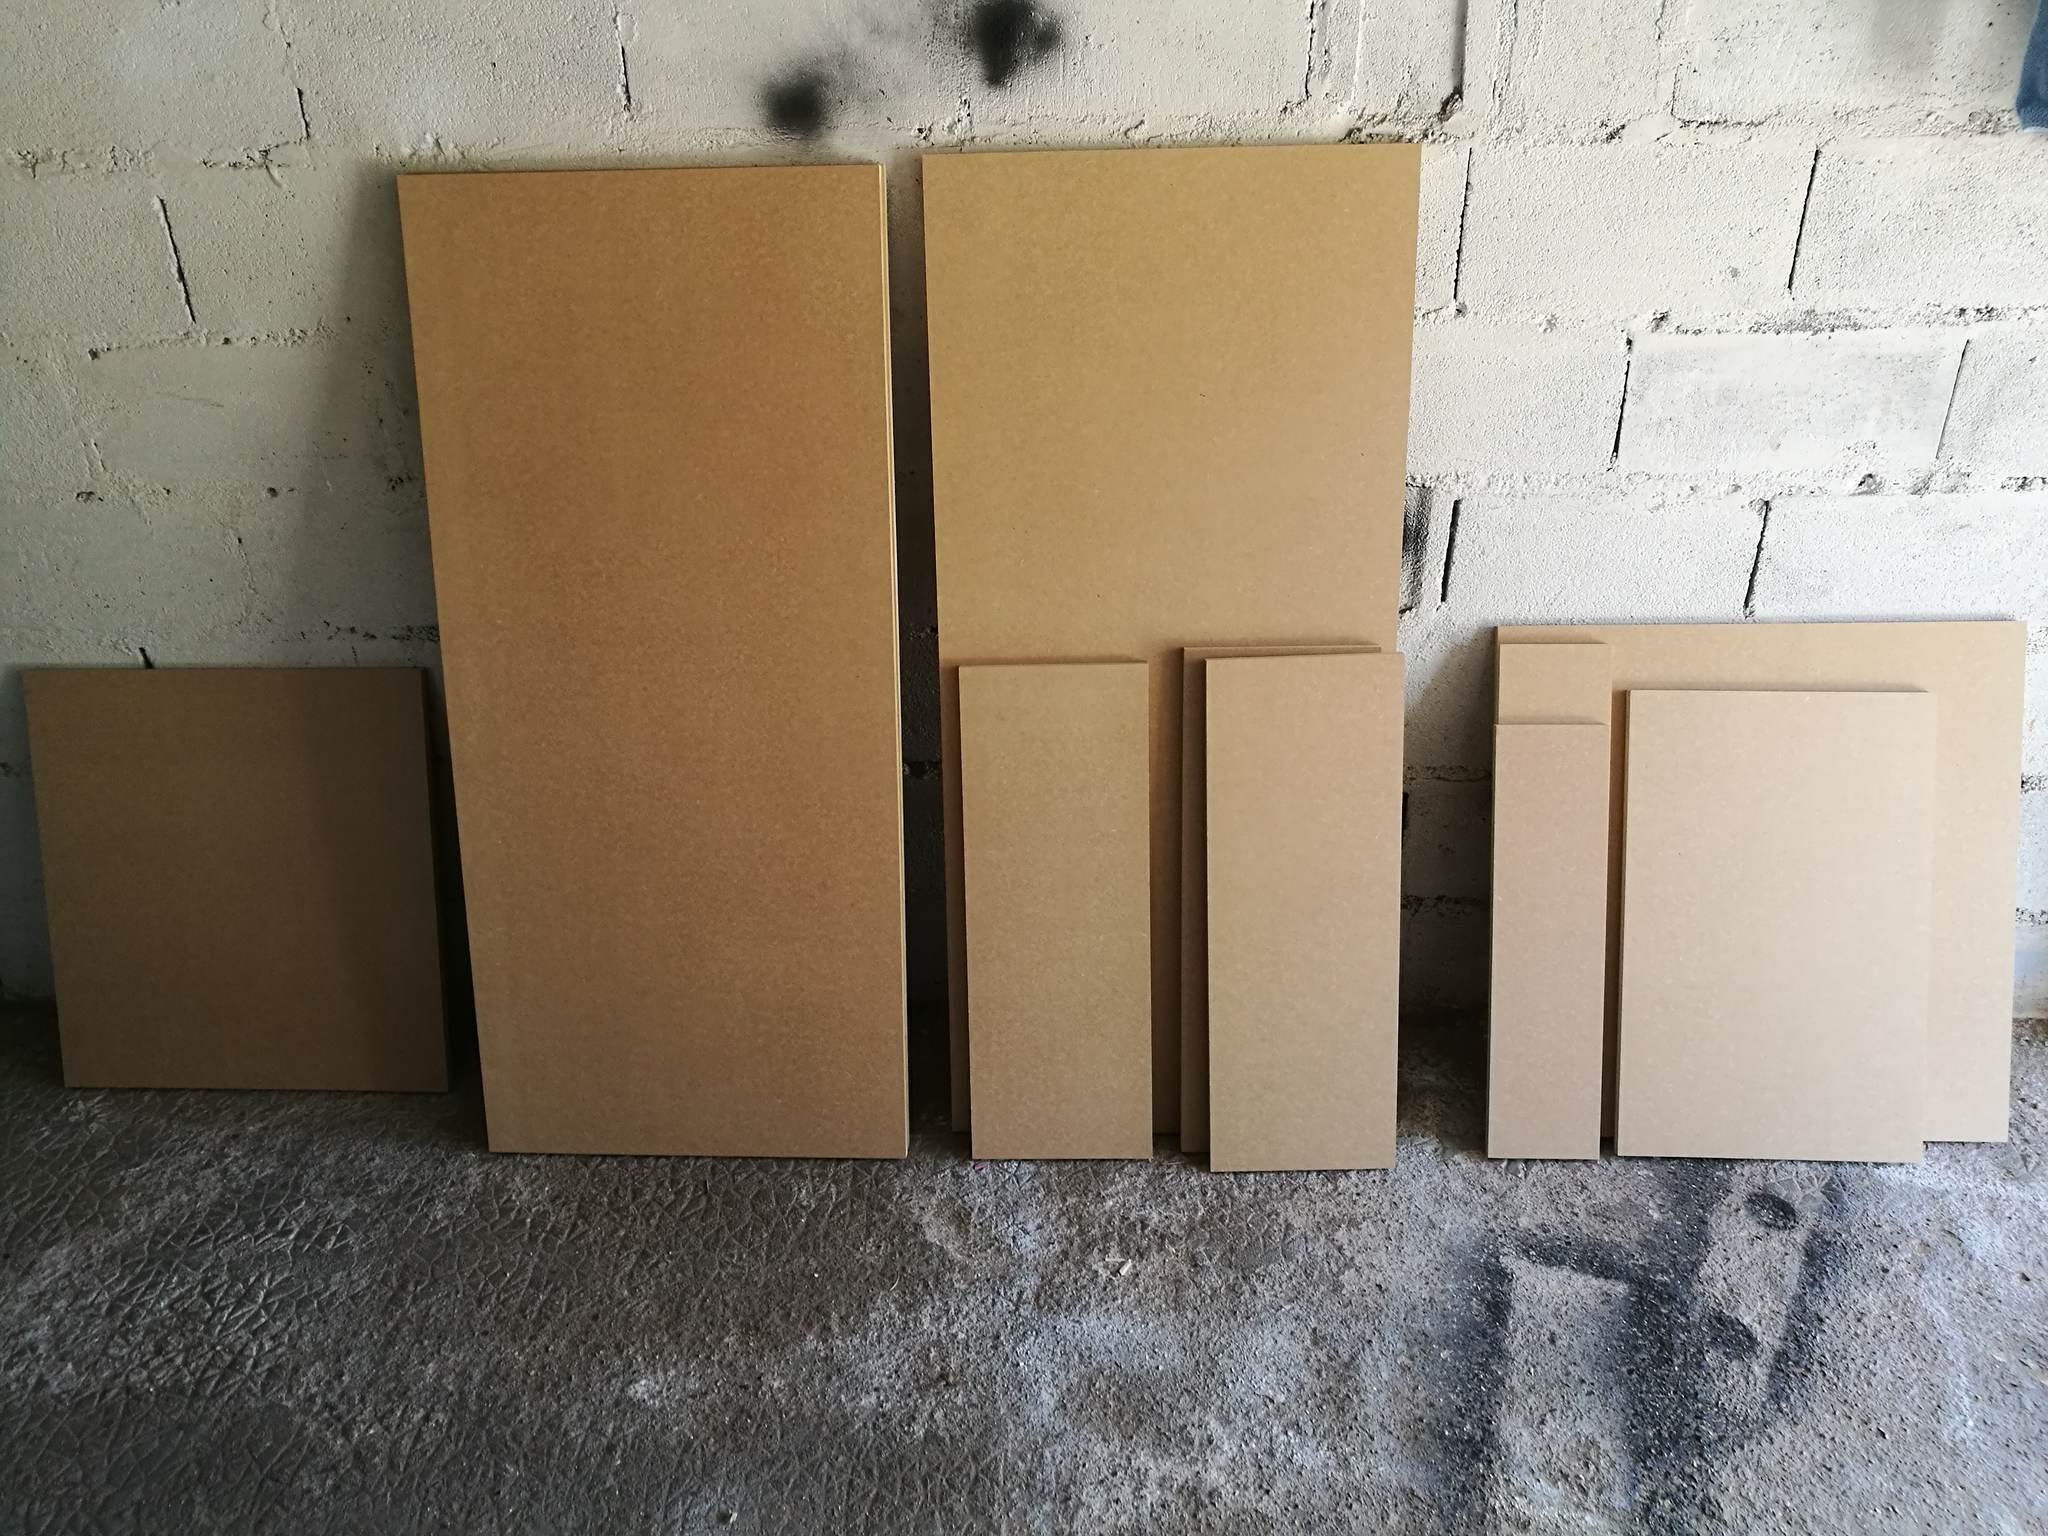 [WIP]projet pincab plant VS. zombie 33312620133745102108435141369271364343580o